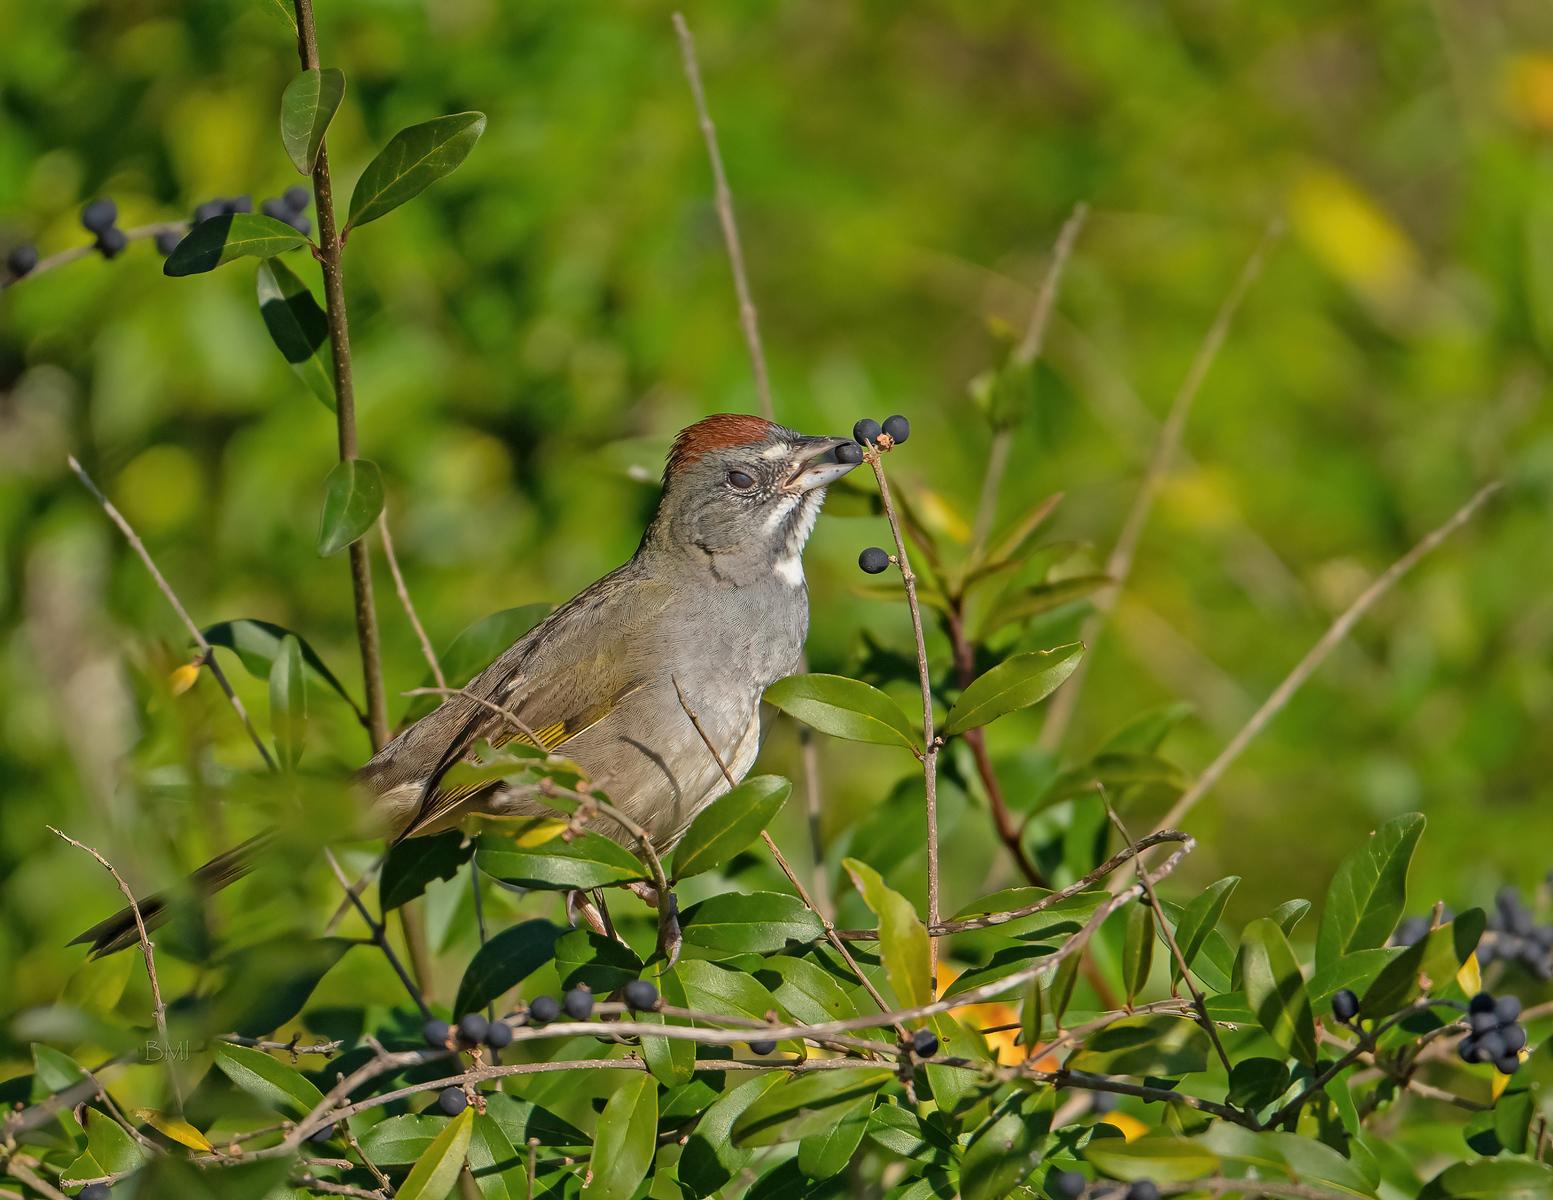 IMAGE: https://photos.smugmug.com/Beautyinthetreesandintheair/Birds/i-JTKBkqj/0/f72955da/X3/Green-tailed%20towhee_9_1-13-21-65-X3.jpg